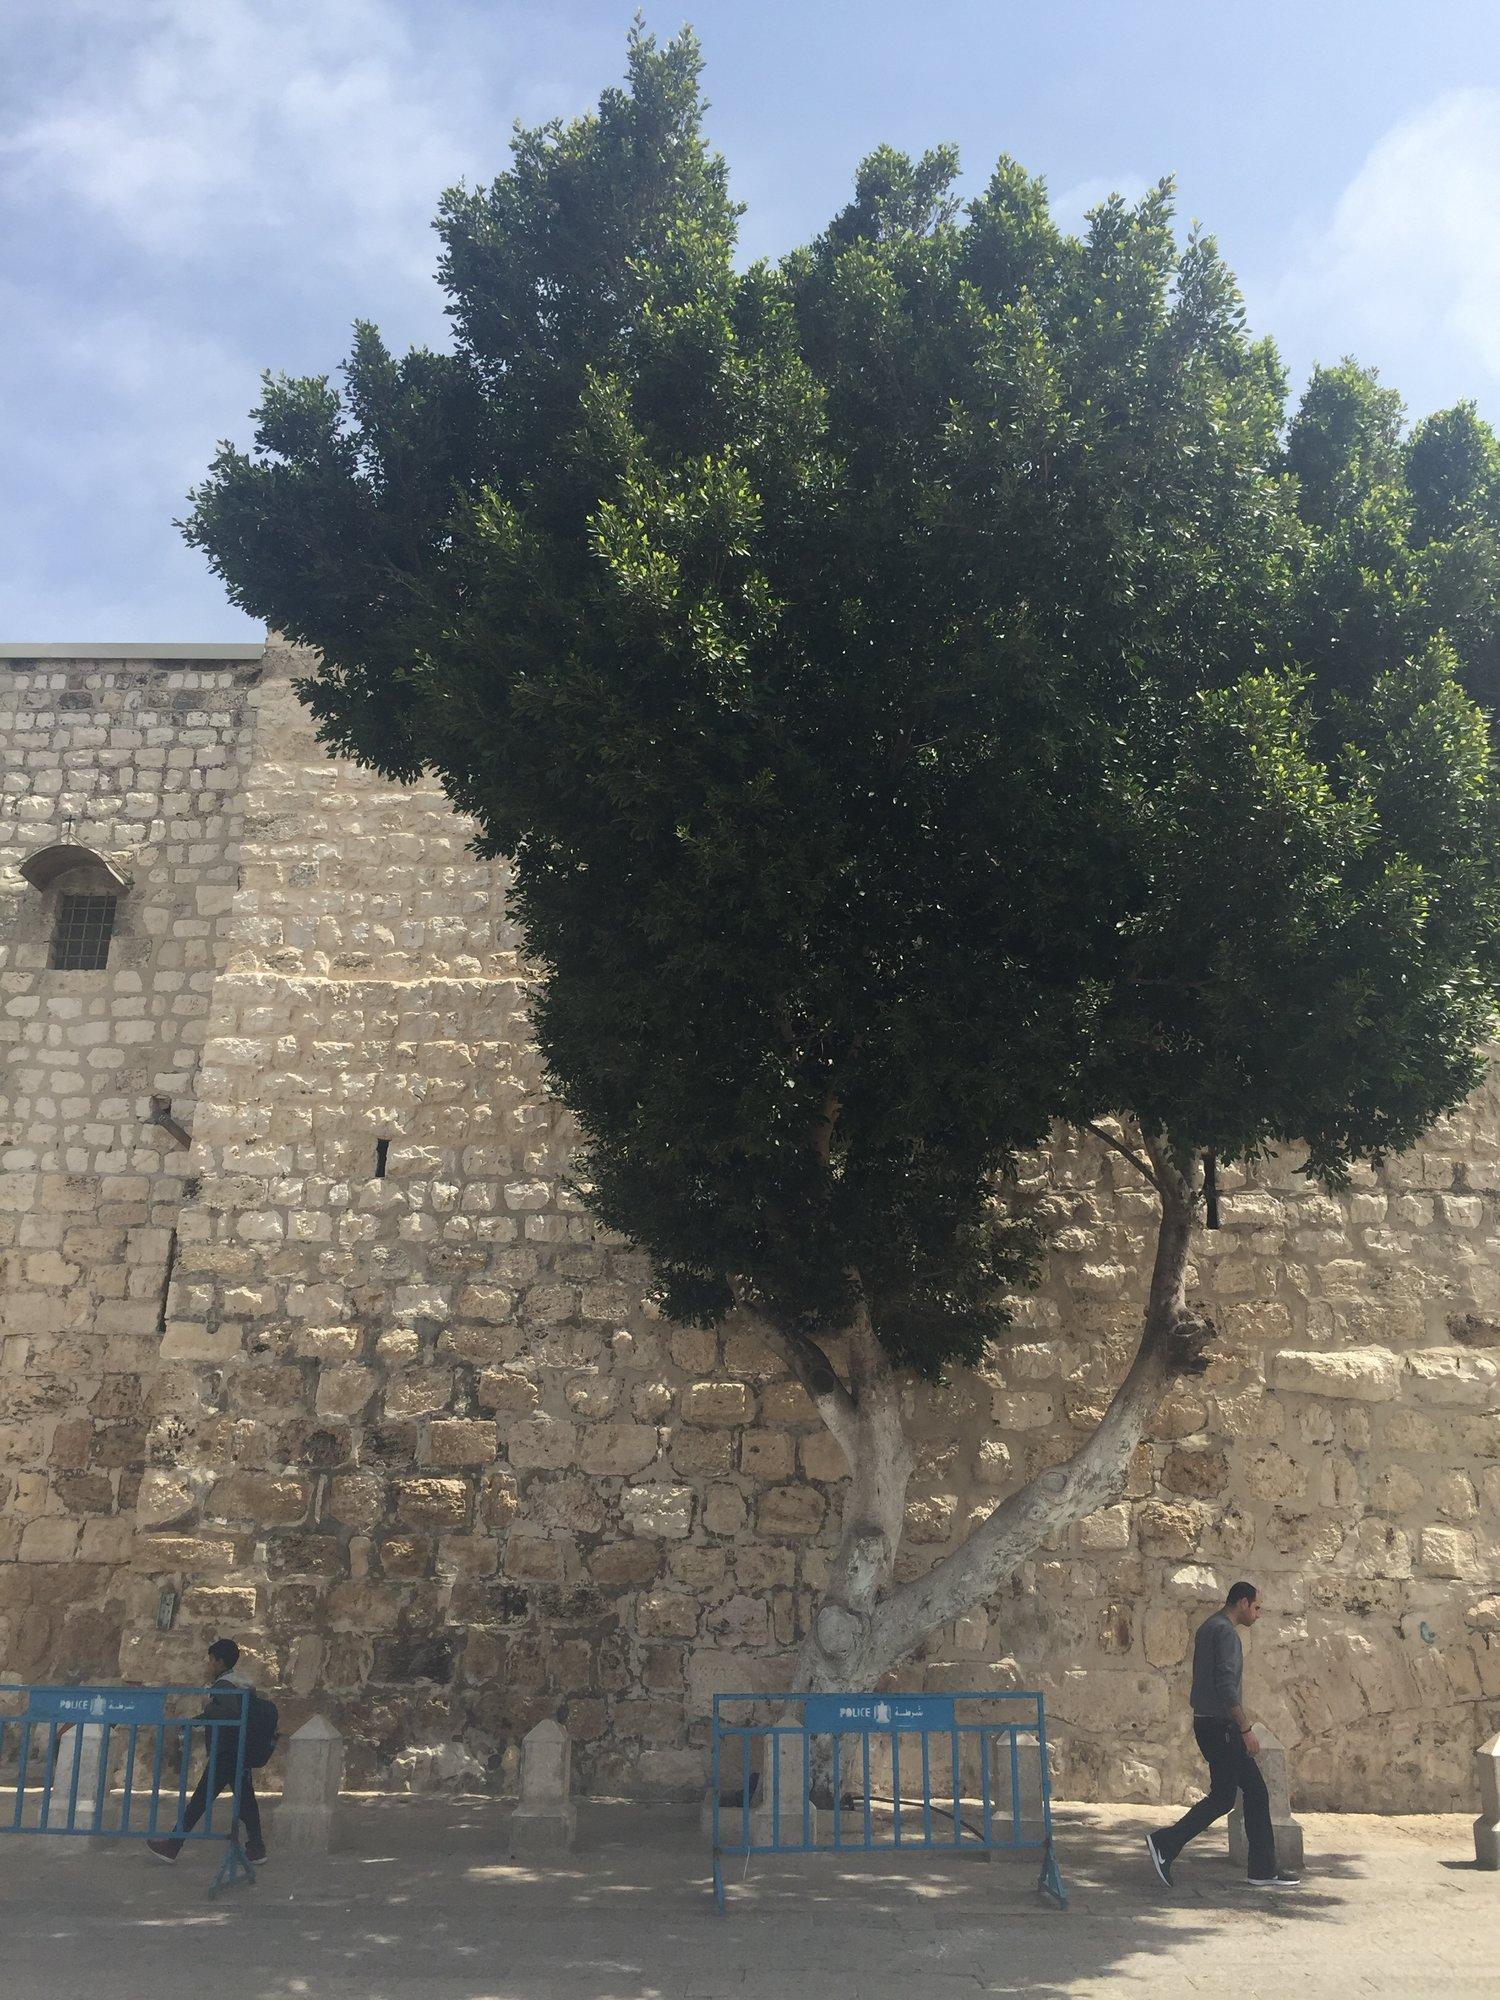 Intrepid Urban Adventures' Occupied Palestine Tour